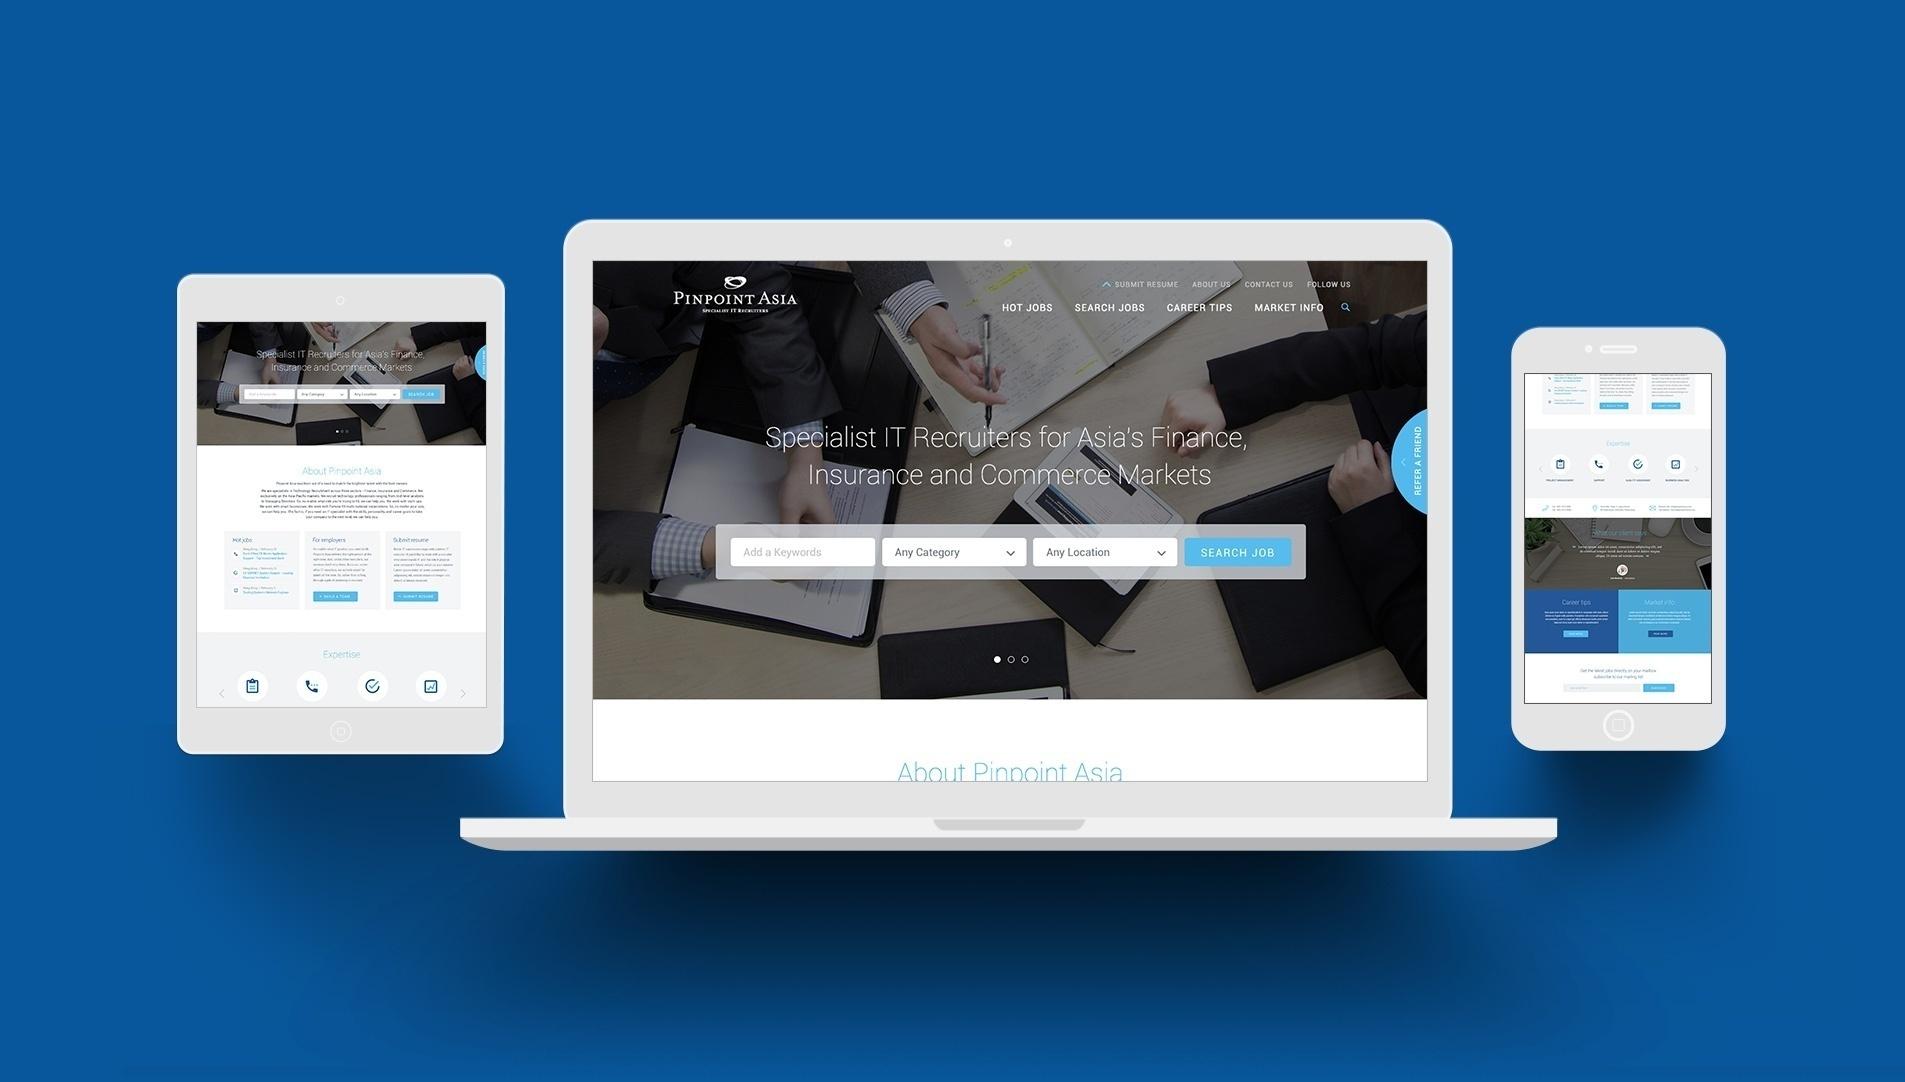 web design hk pinpoint asia slideshow 00